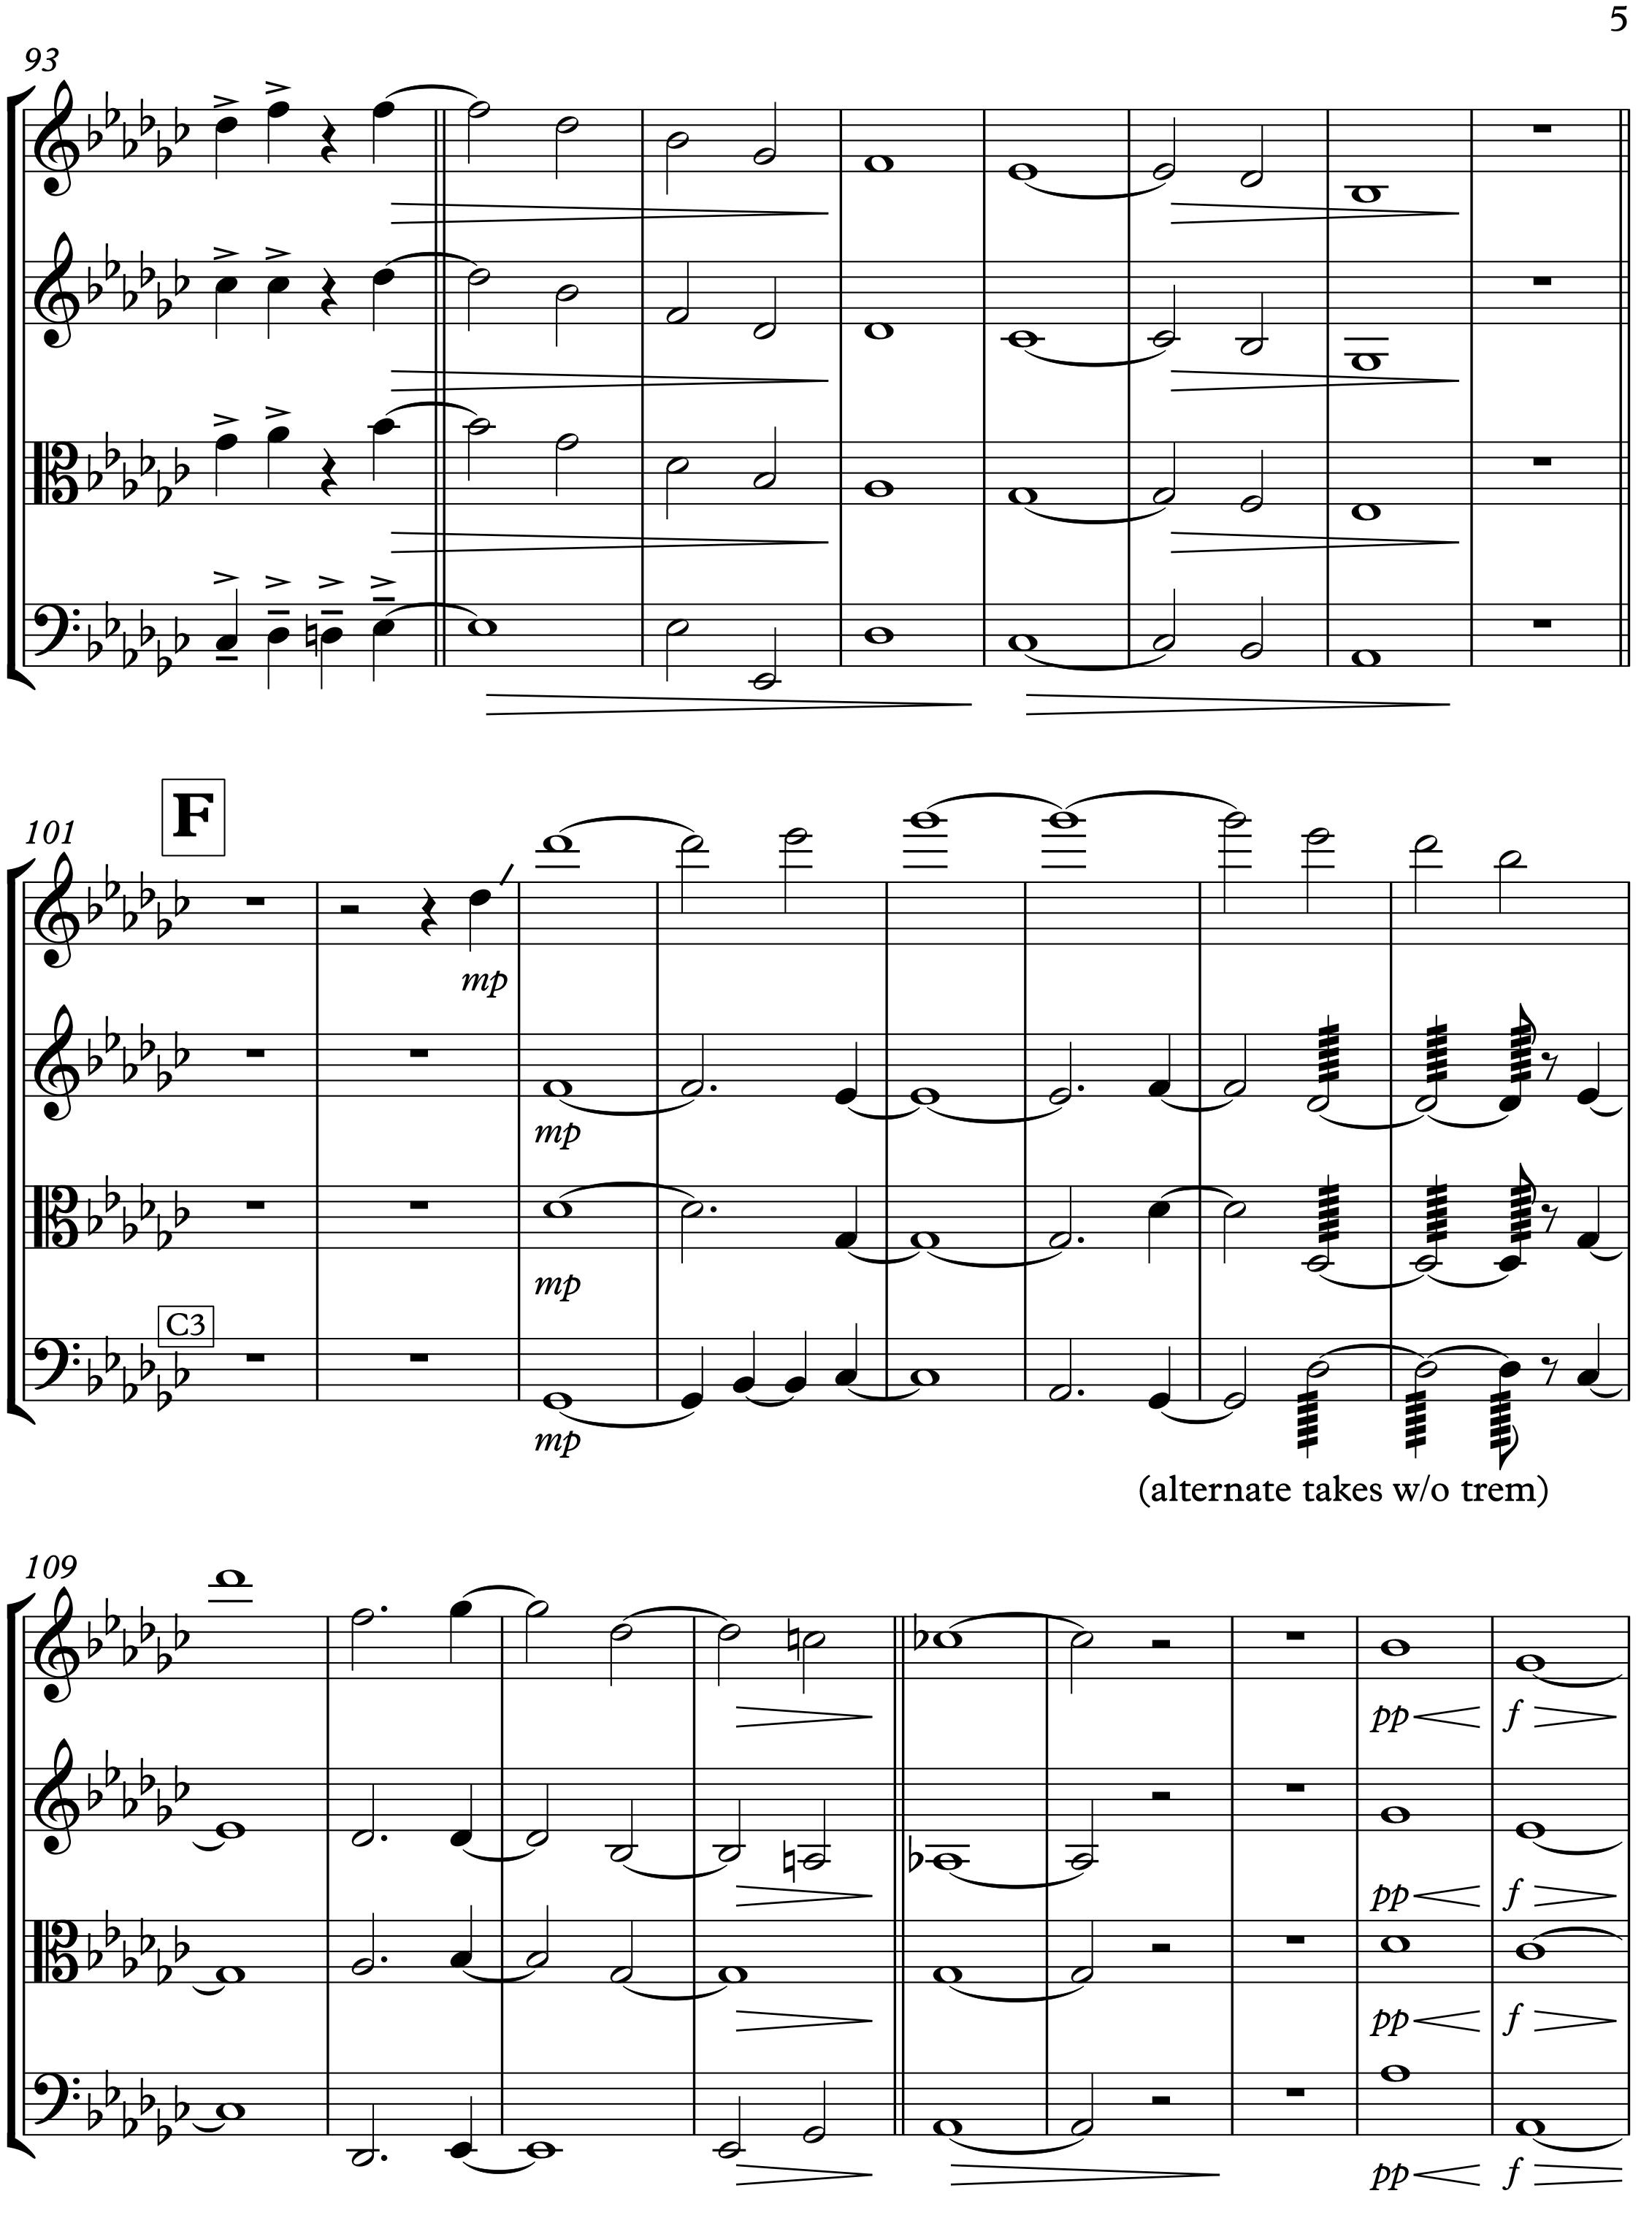 Didn't Mean to Fall in Love - Full Score-5.jpg